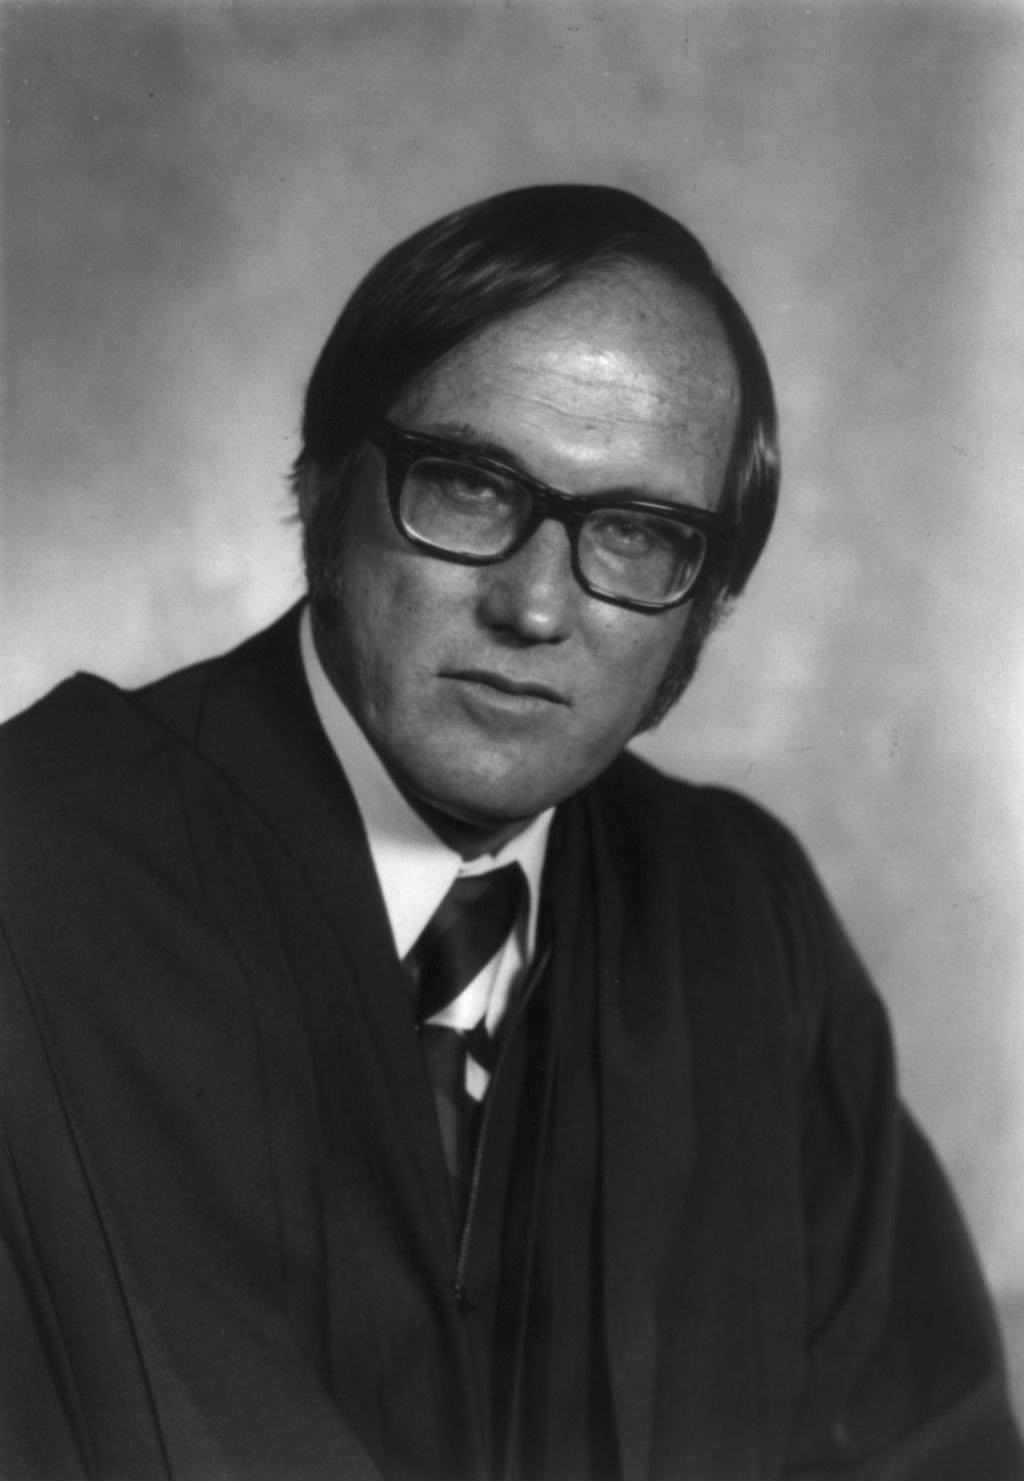 Constitutional Law Reporter - Donald Scarinci